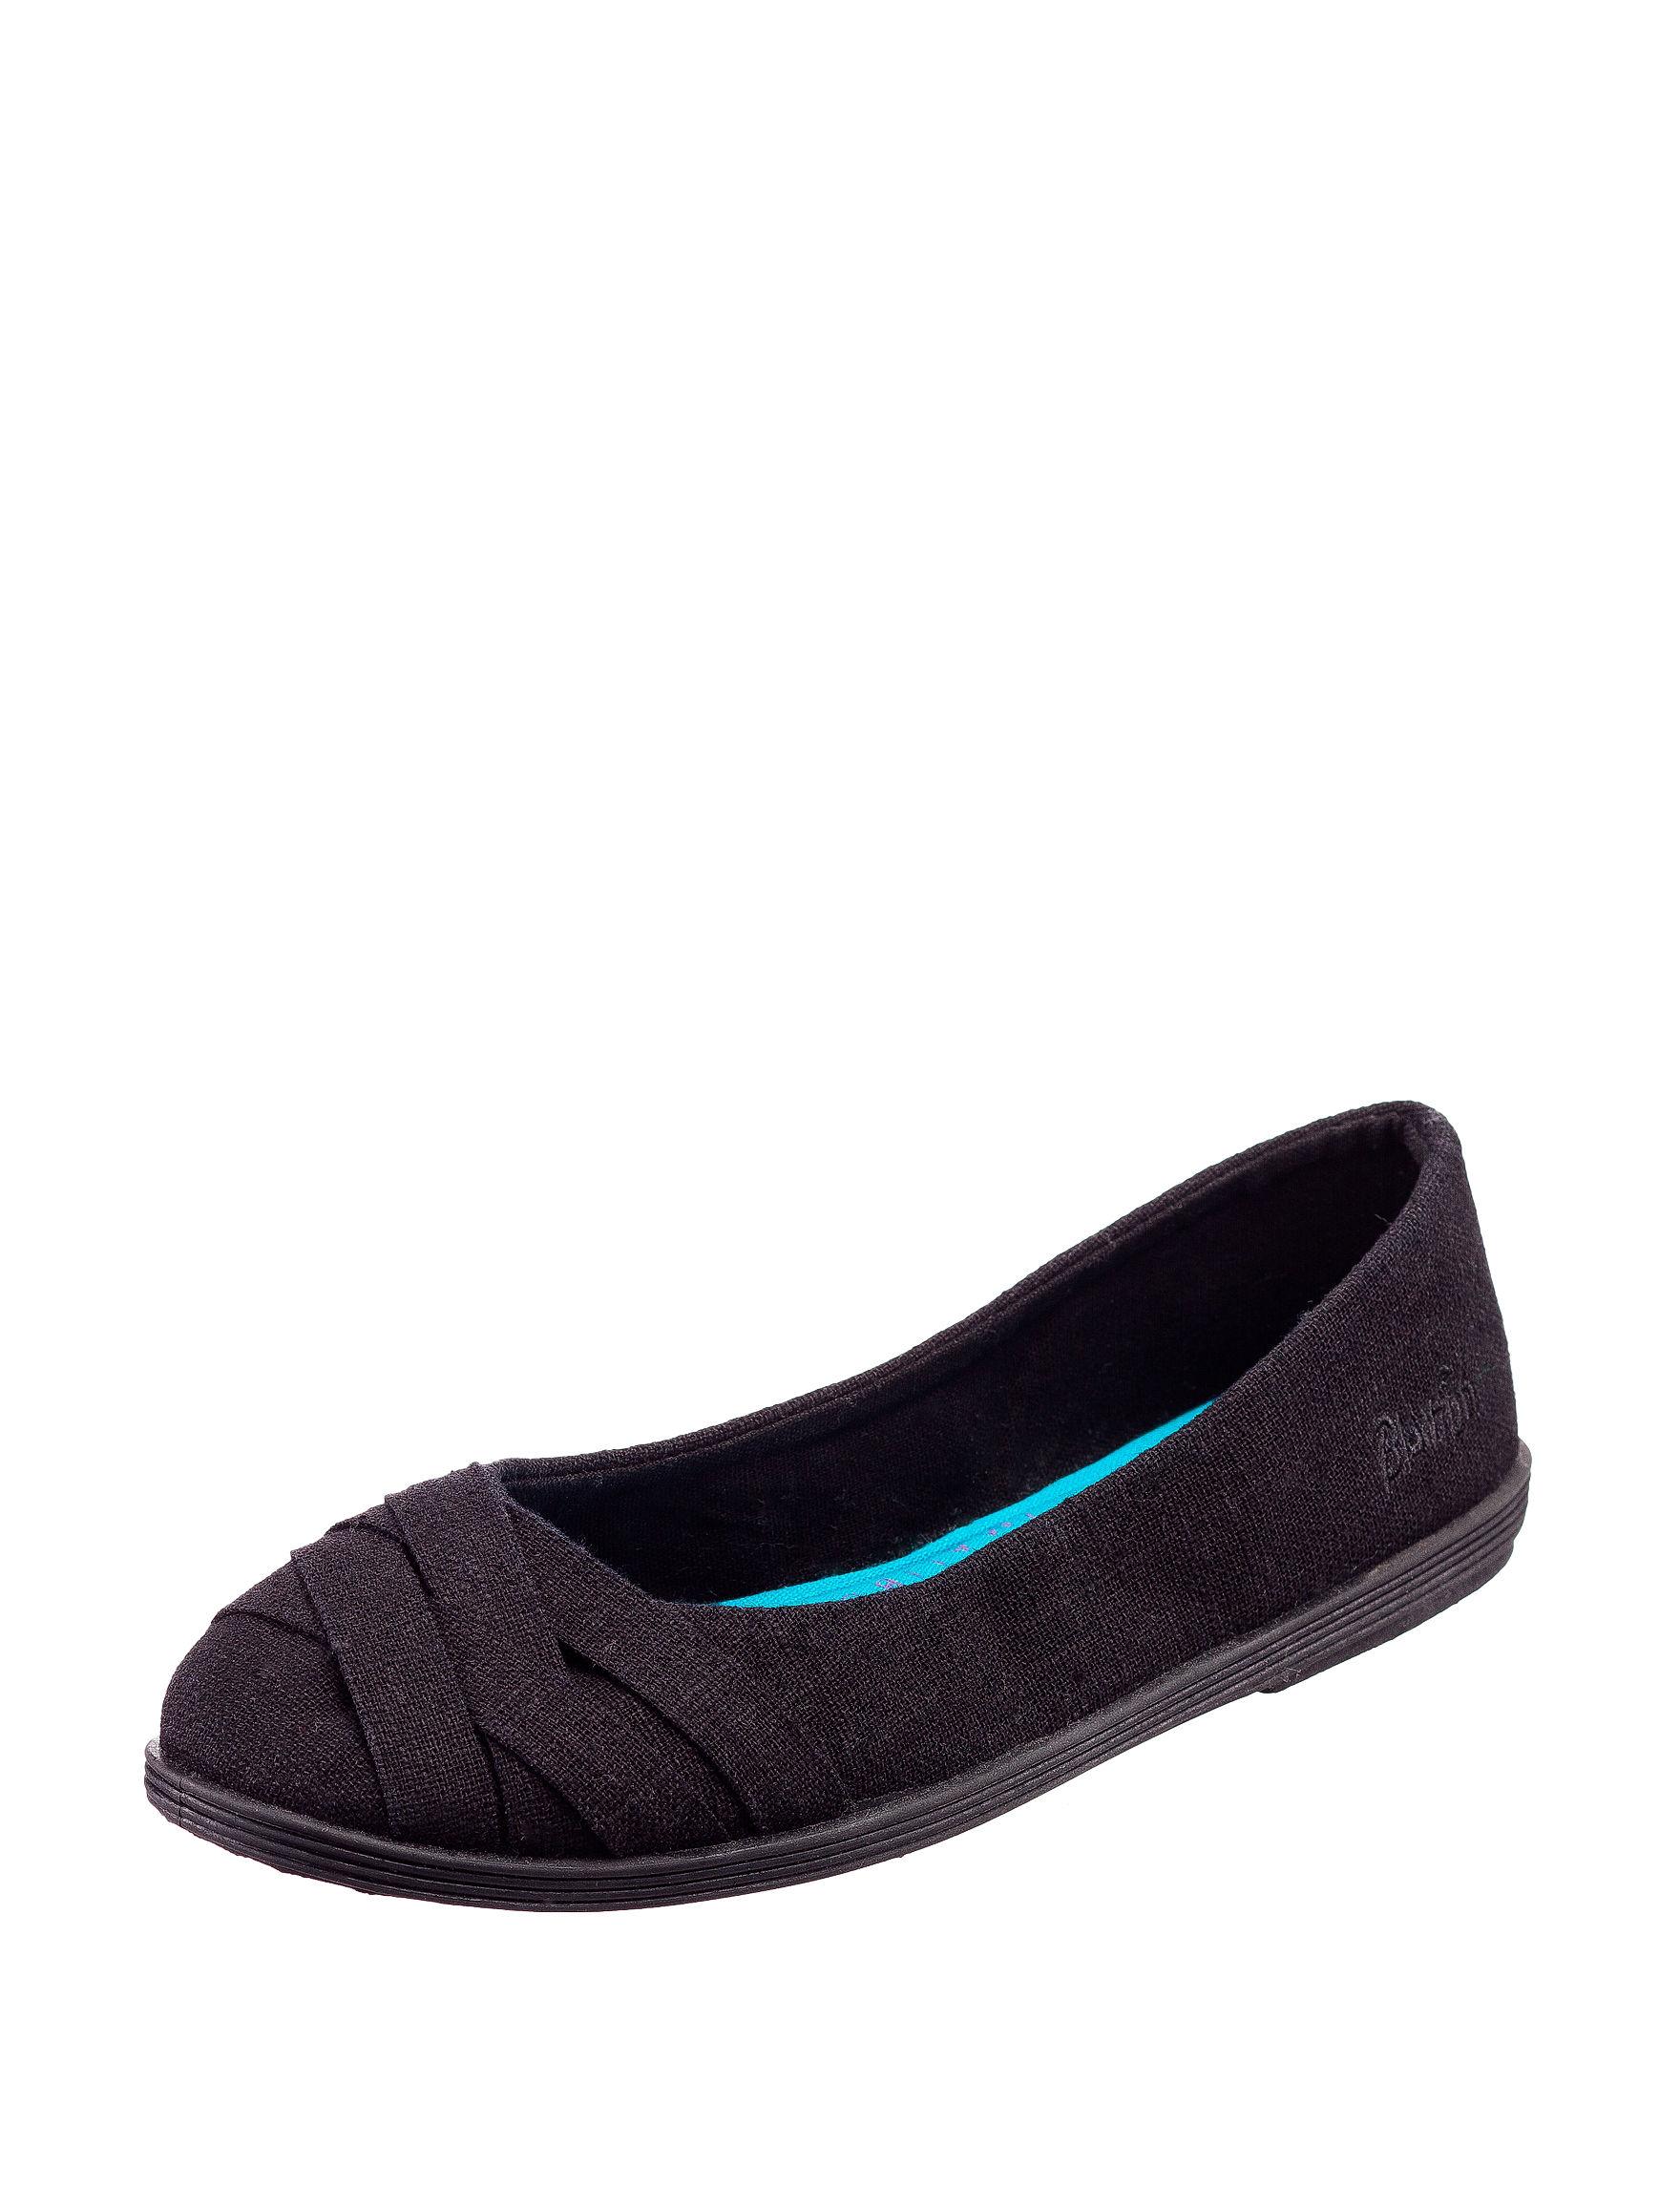 Blowfish Shoes Glo Ballet Flats